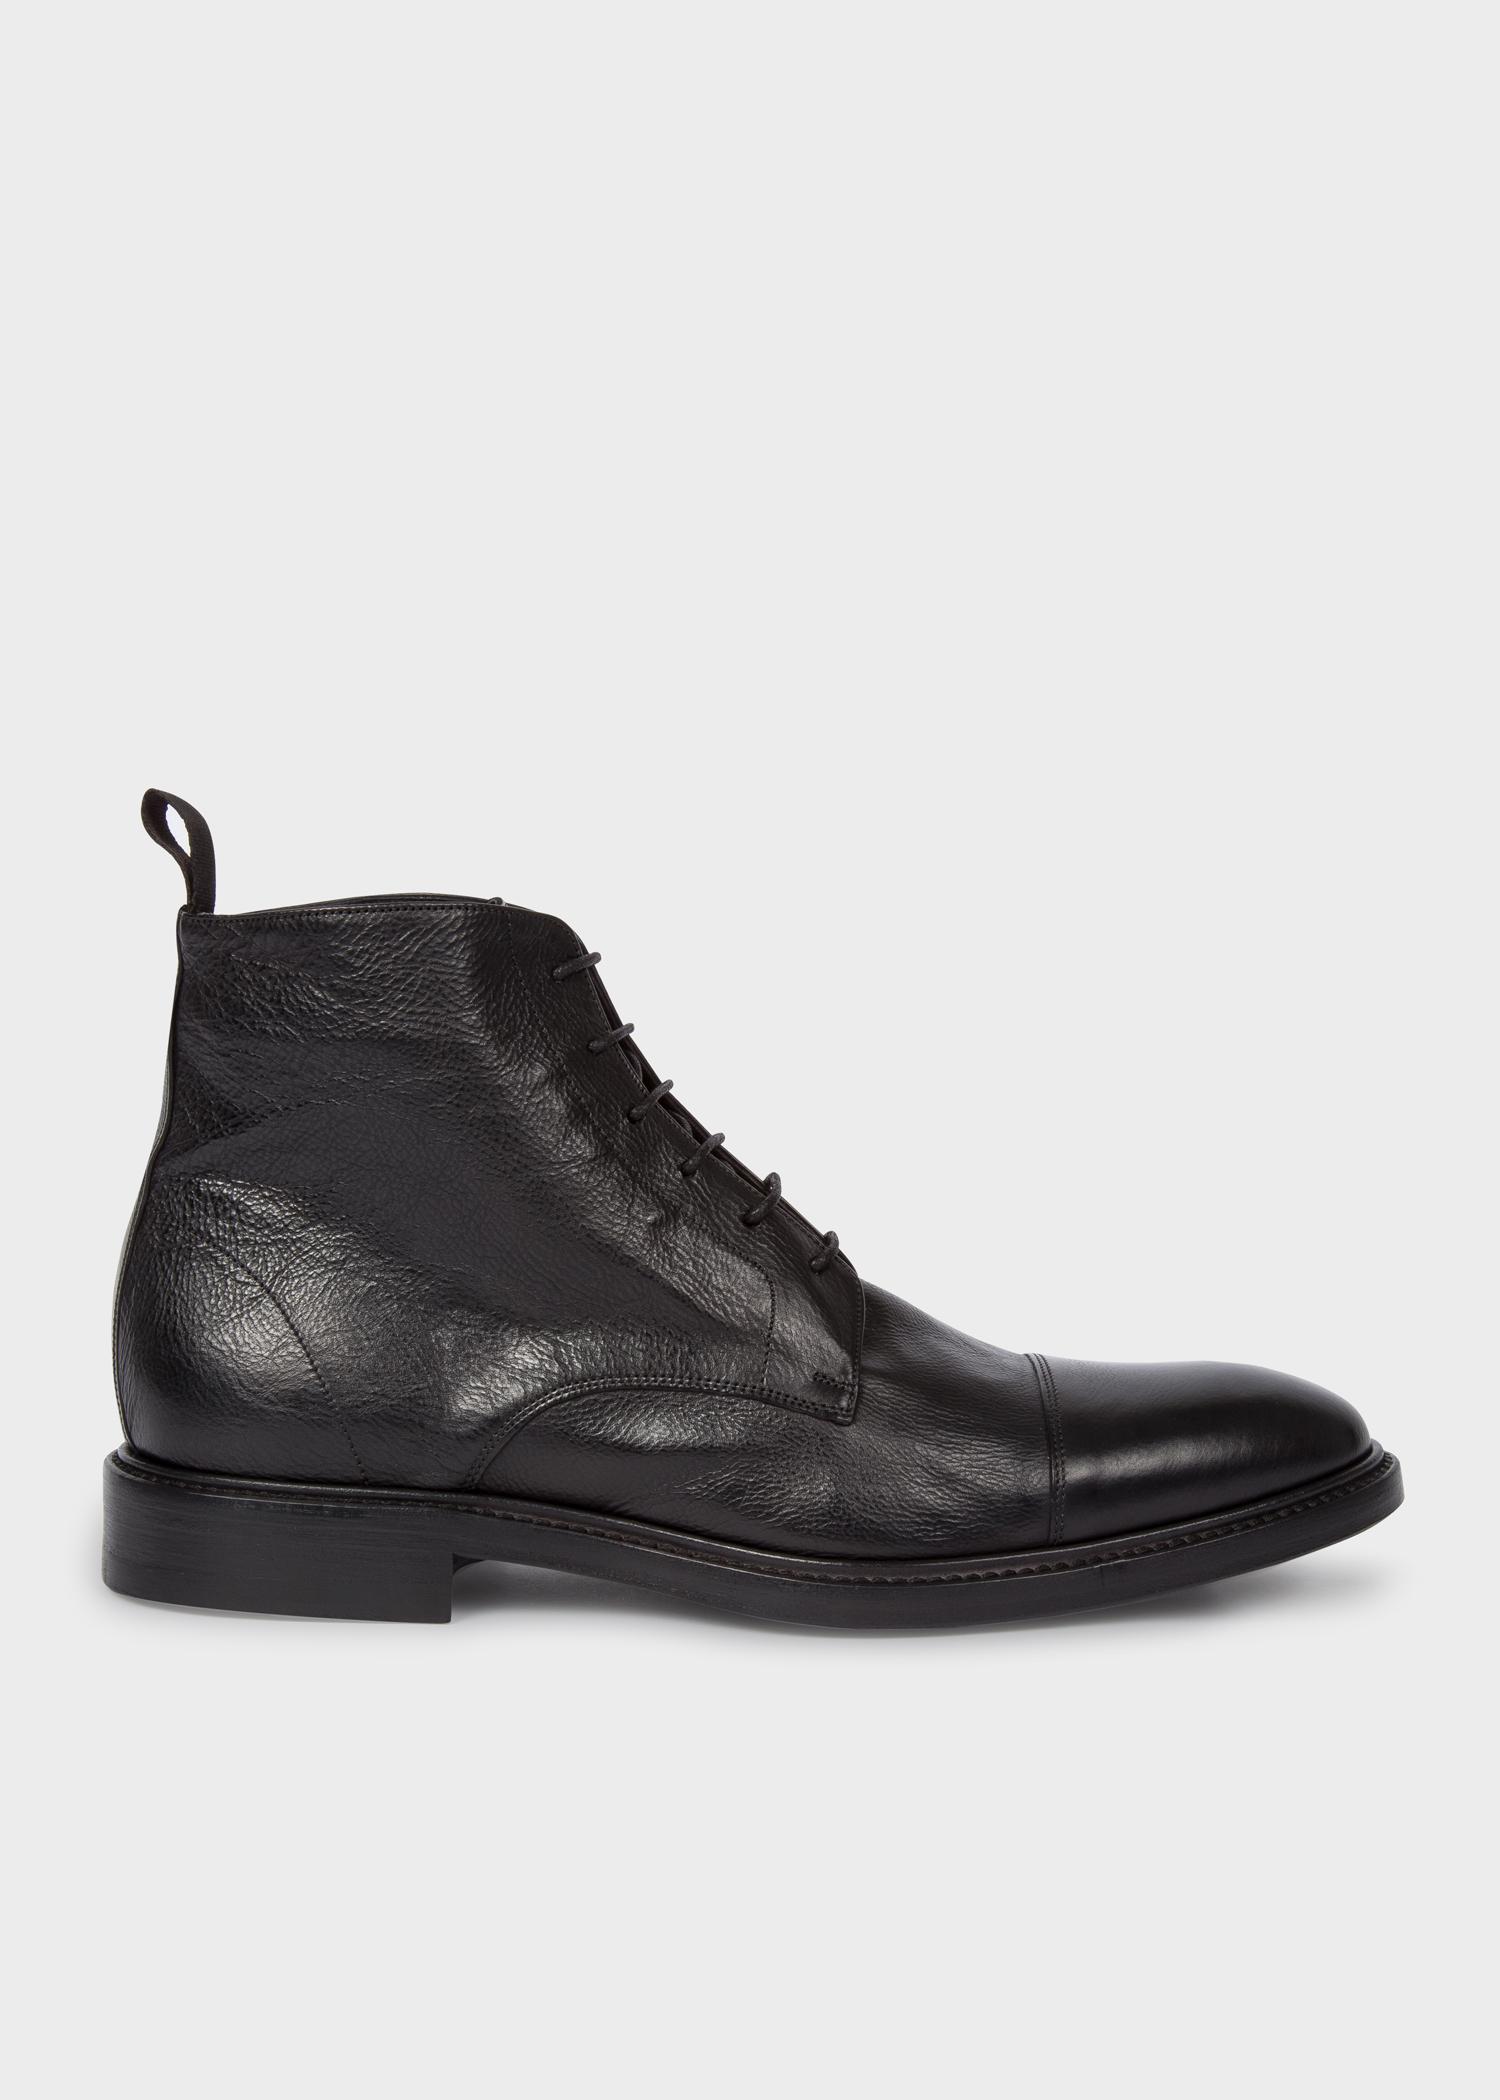 2e3eb7a9f96e Men s Dip-Dyed Black Calf Leather  Jarman  Boots - Paul Smith Denmark